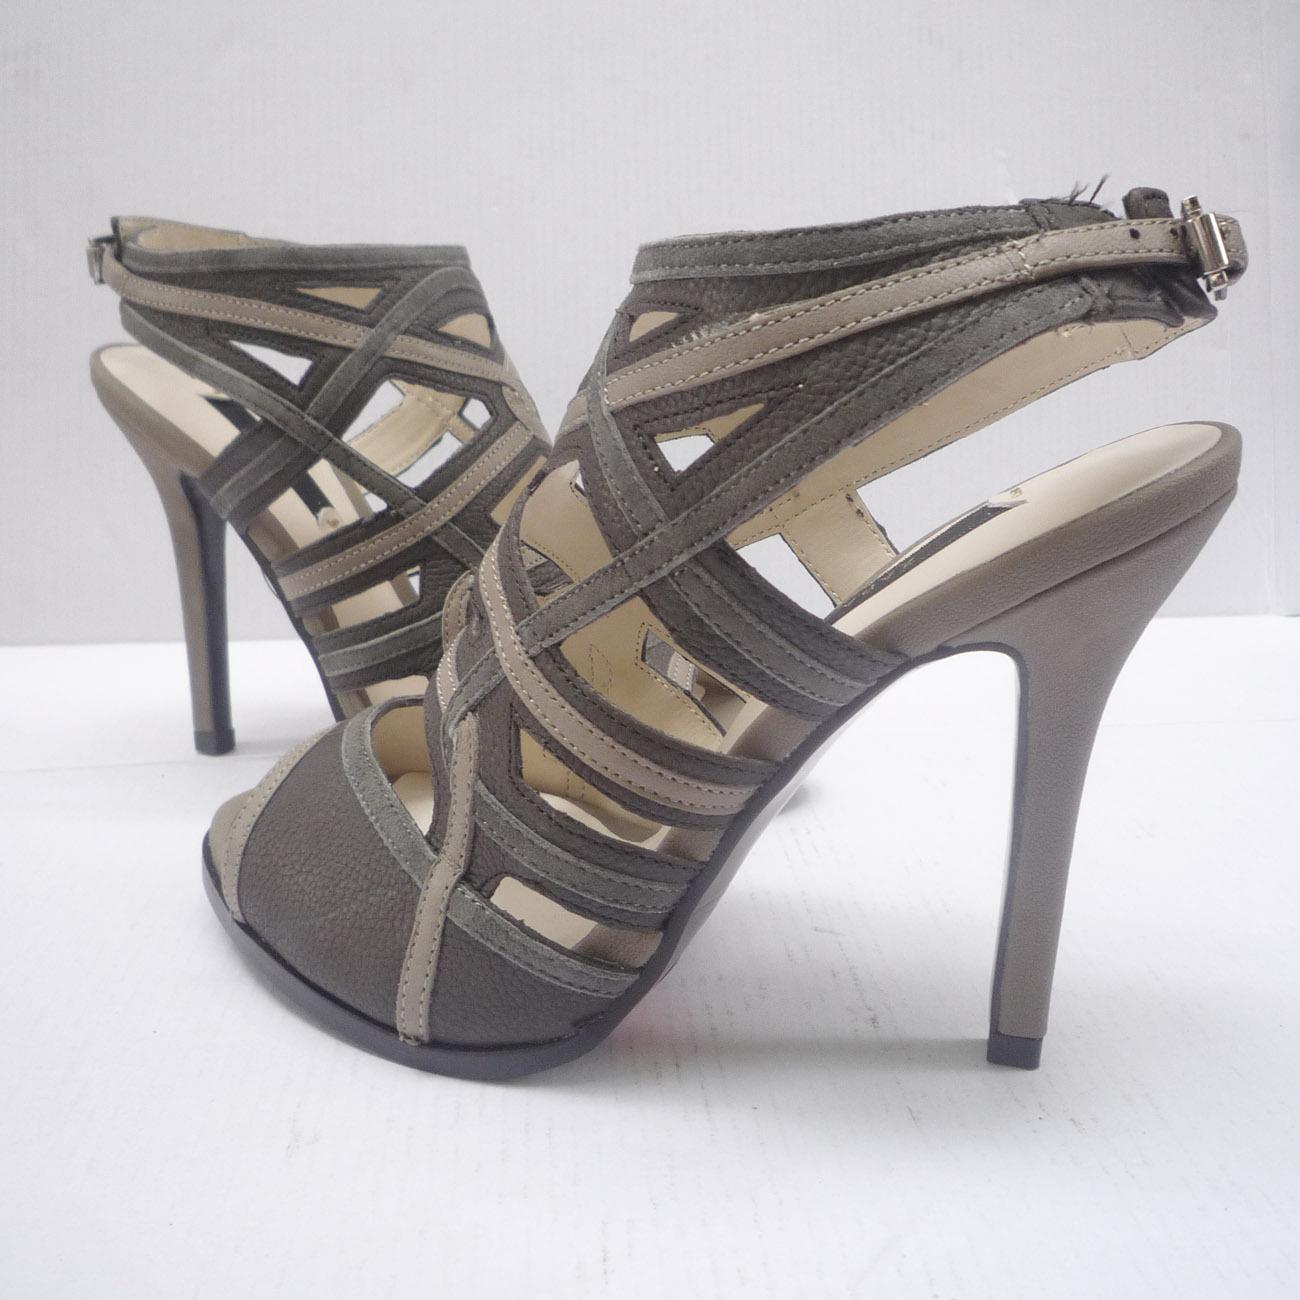 Босоножки 1024 Zara На высоком каблуке (6- 8 см)